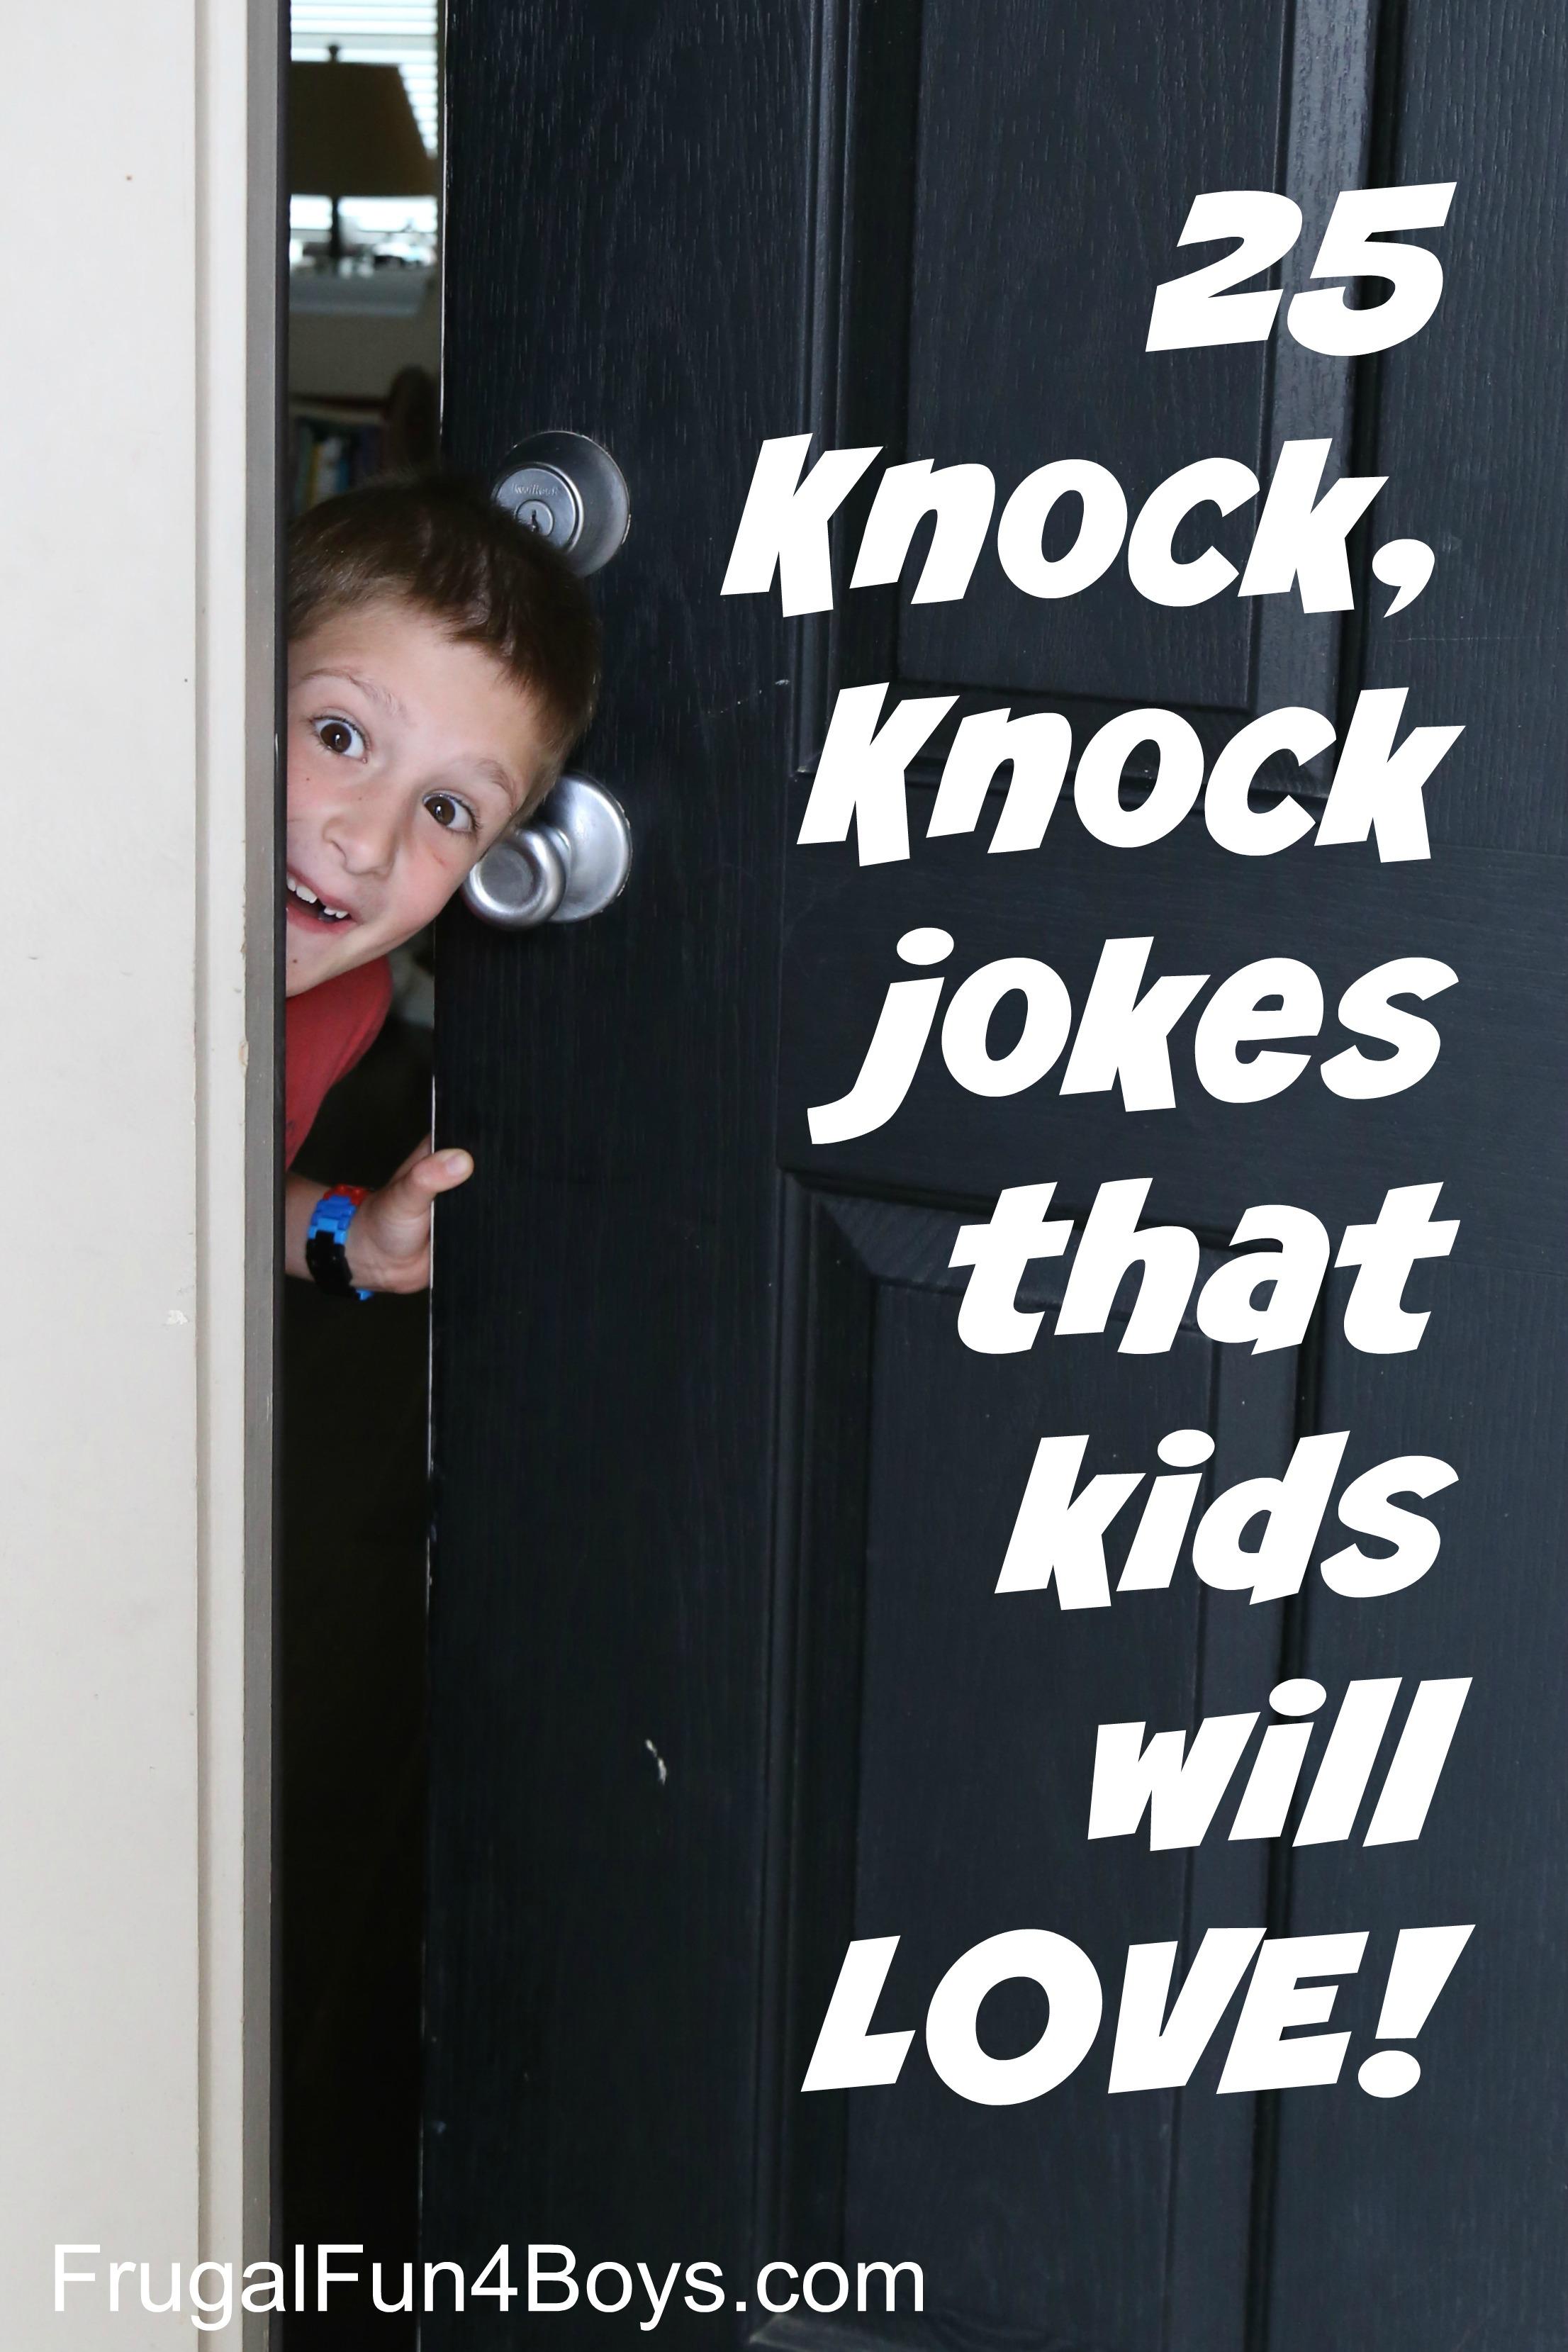 Image of: Urdu 25 Hilarious Knock Knock Jokes For Kids Frugal Fun For Boys 25 Hilarious Knock Knock Jokes For Kids Frugal Fun For Boys And Girls